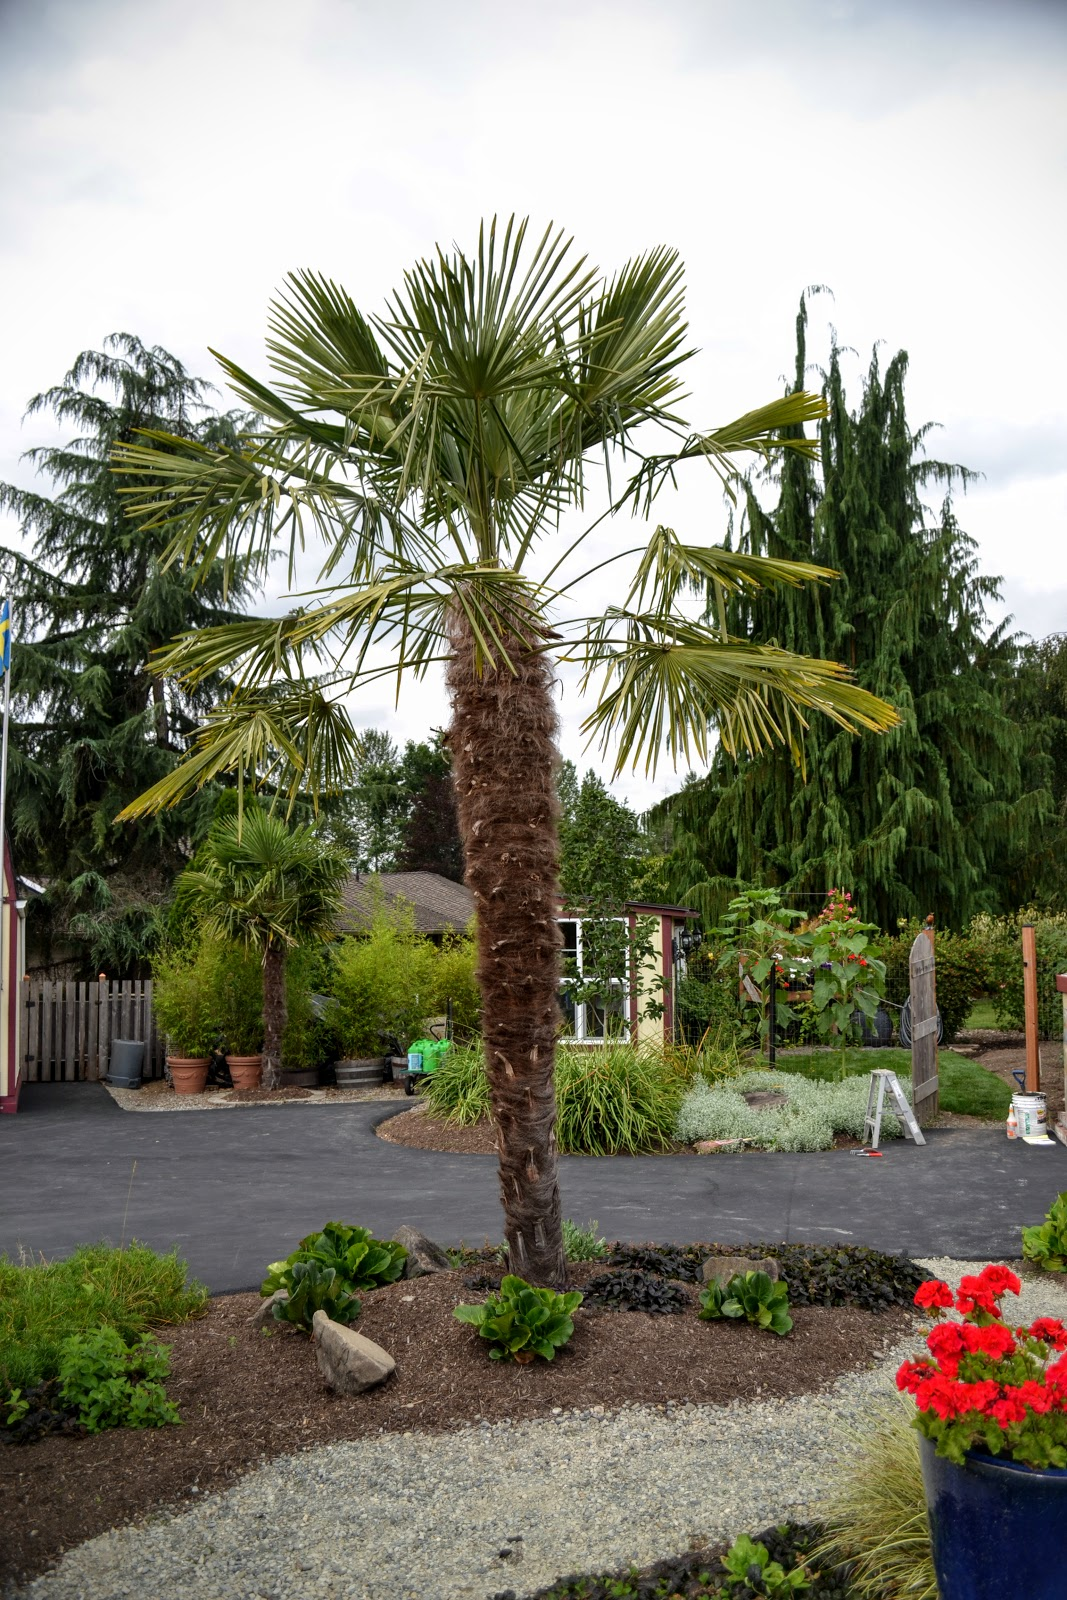 Robins Kitchen Garden City The Outlaw Gardener The Issaquah Garden Of Art Converse